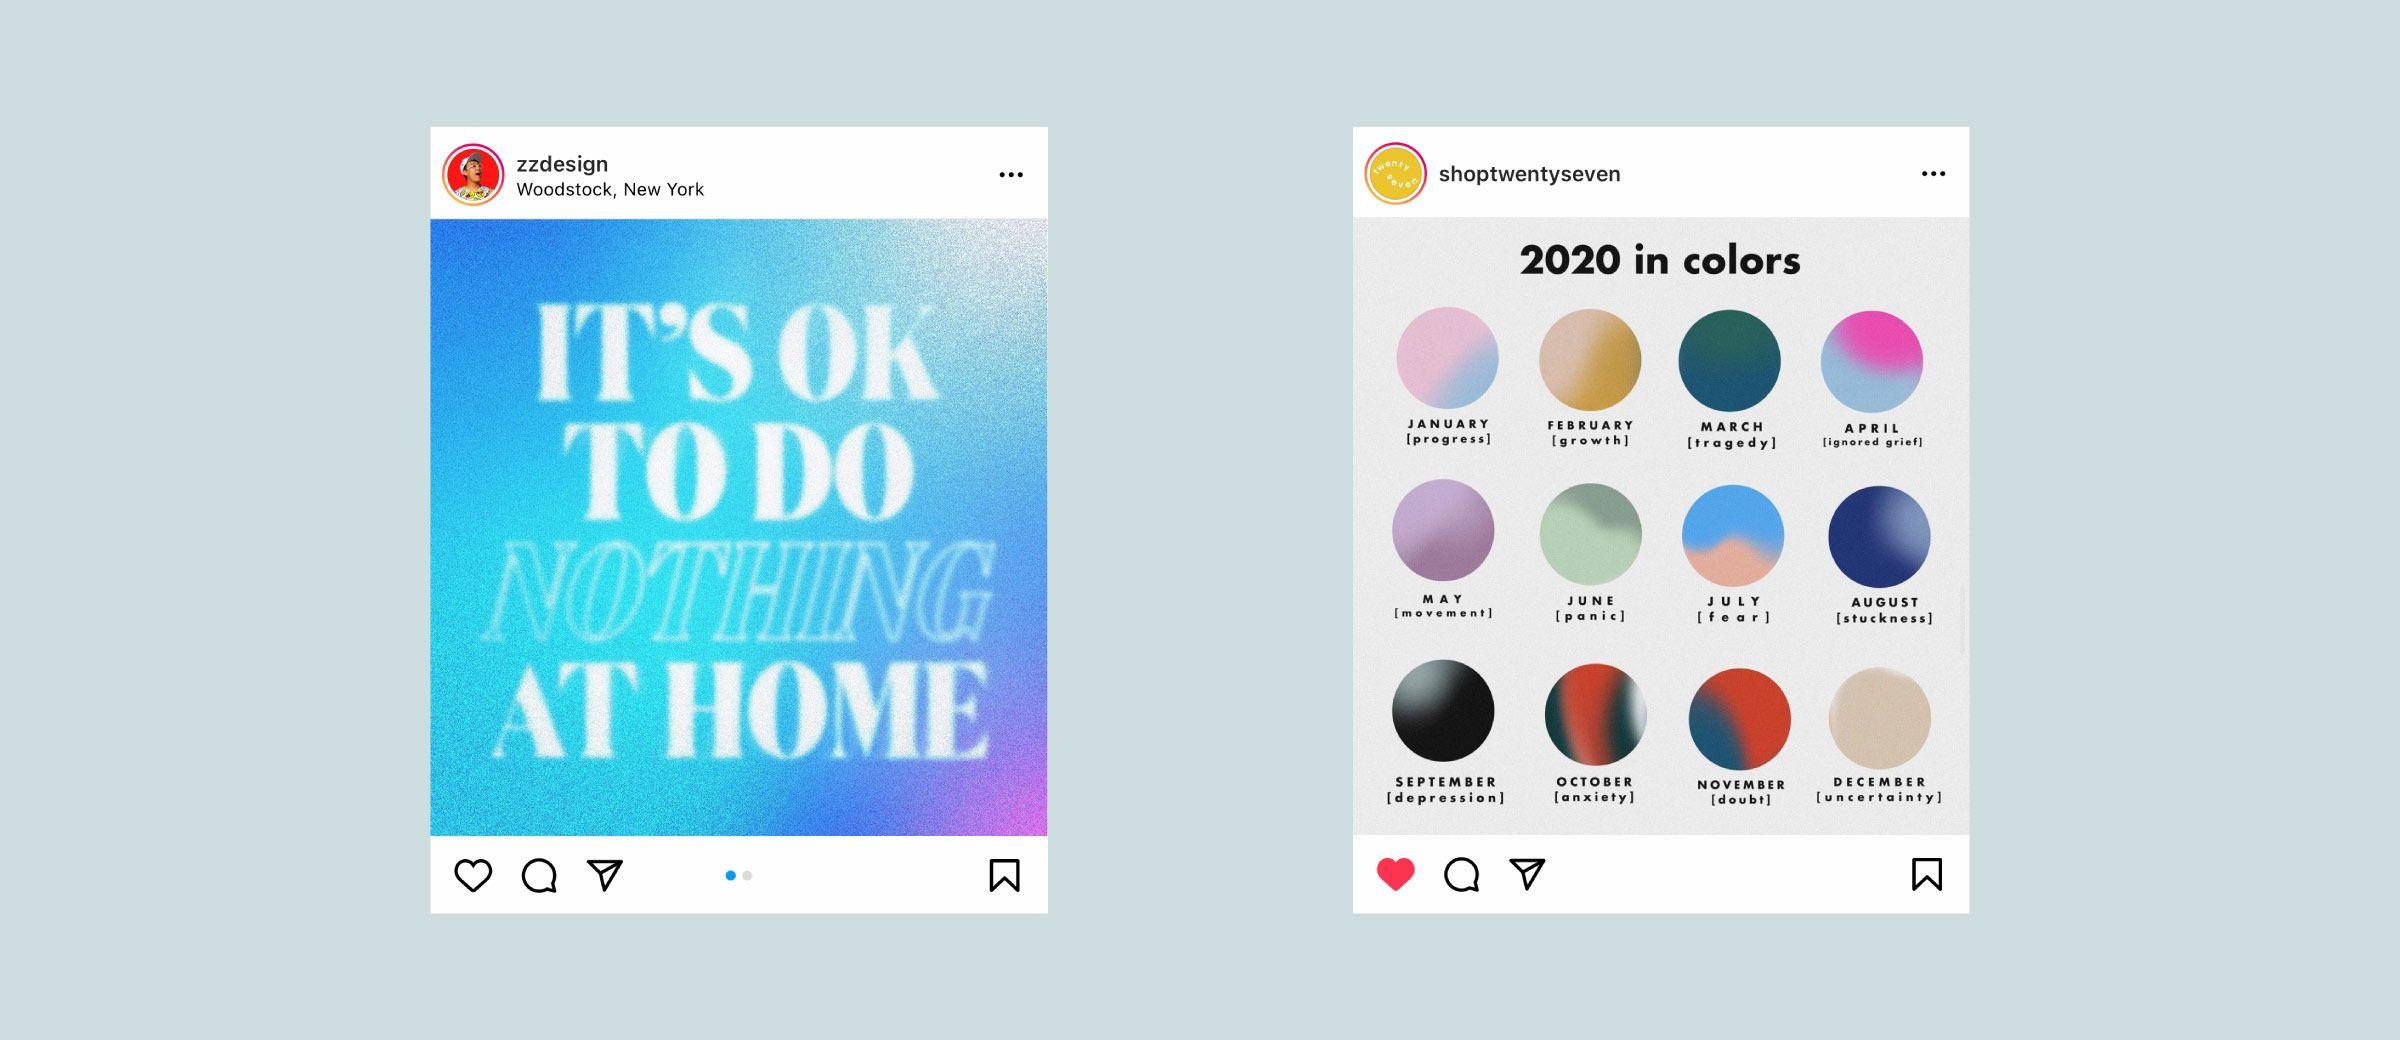 PLANOLY-Blog-Post--2021-Design-Trends-Img2